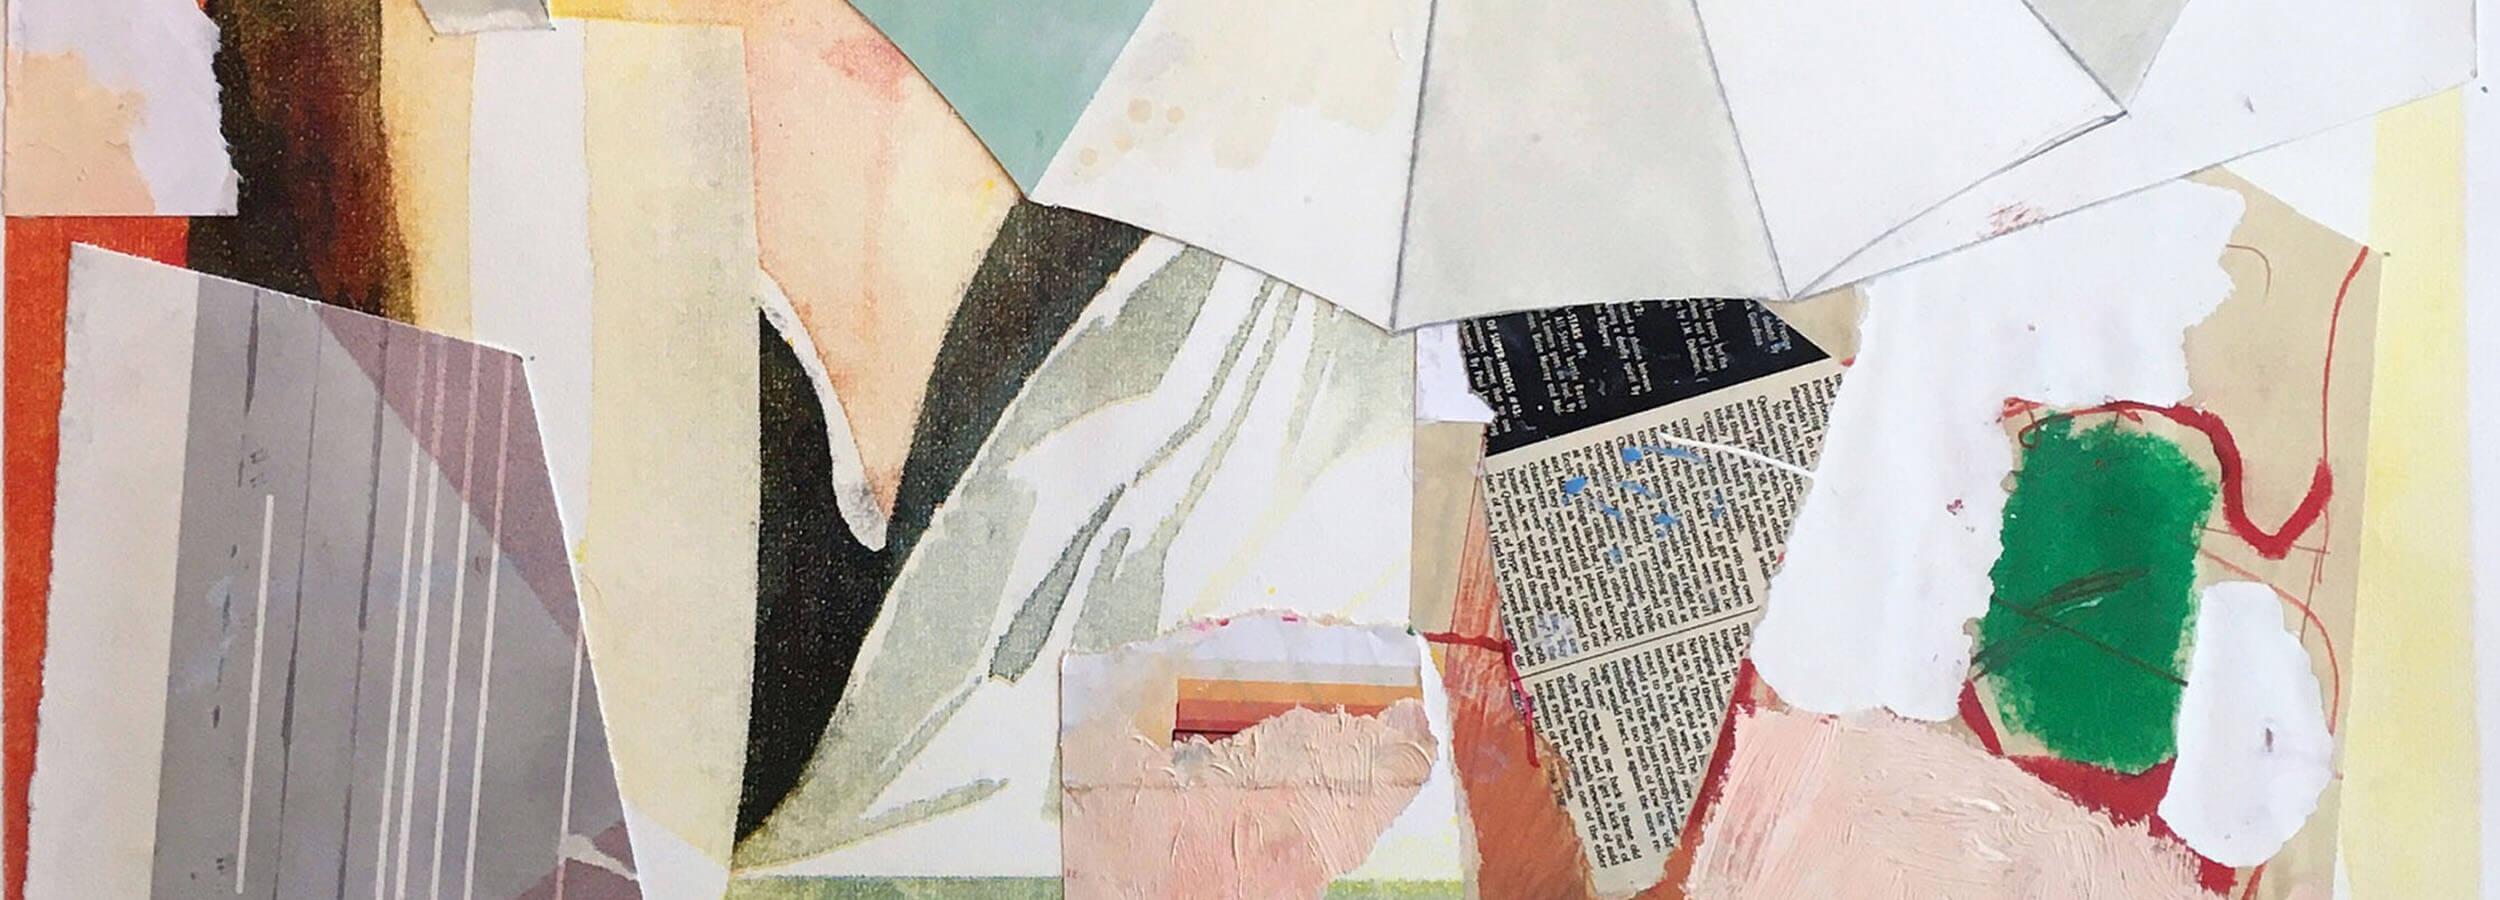 Inzoomning av konstverk av Nicolay Aamodt.